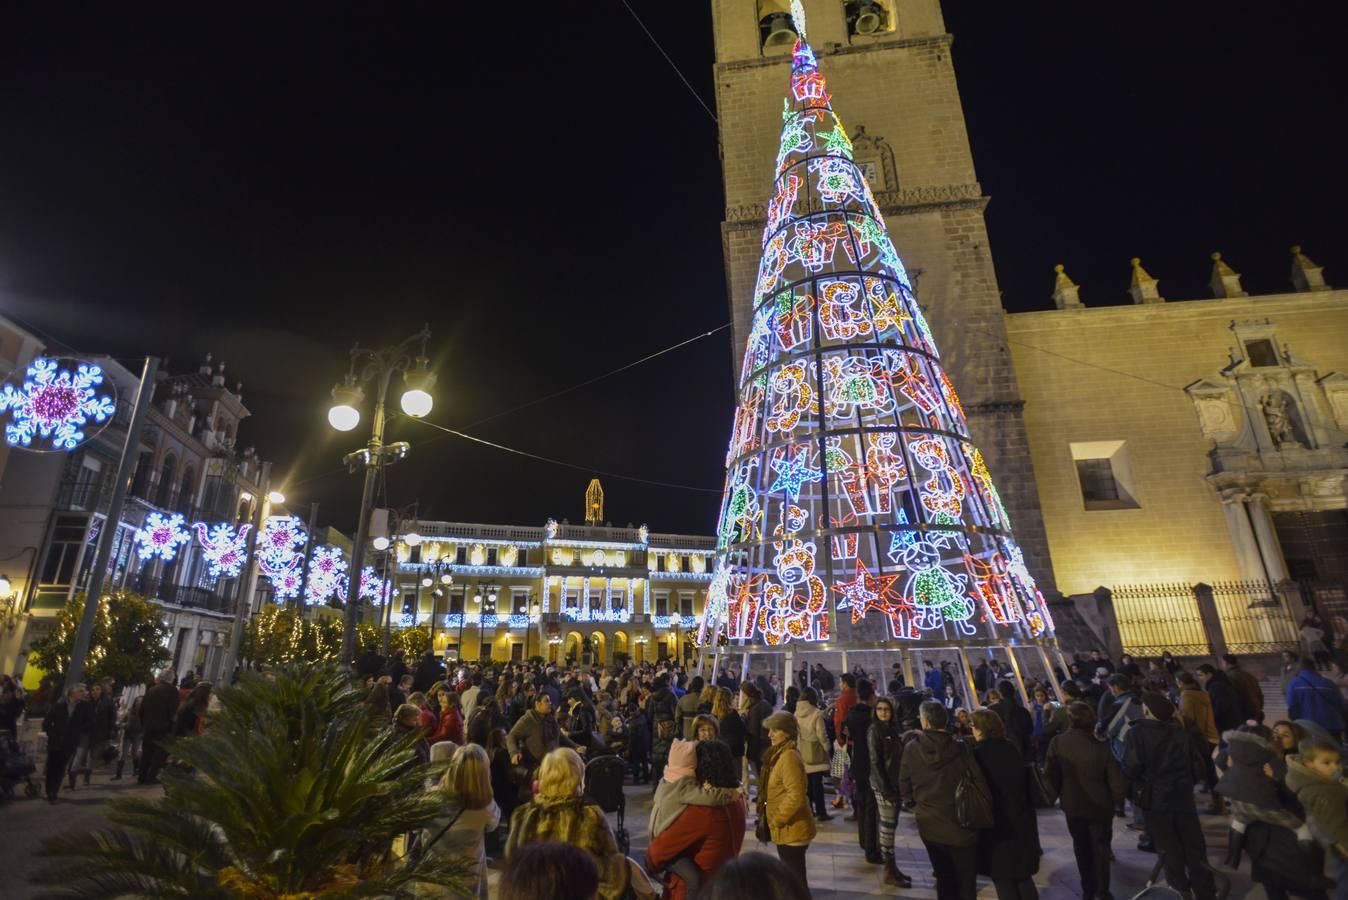 Encendido oficial del alumbrado navideño en Badajoz